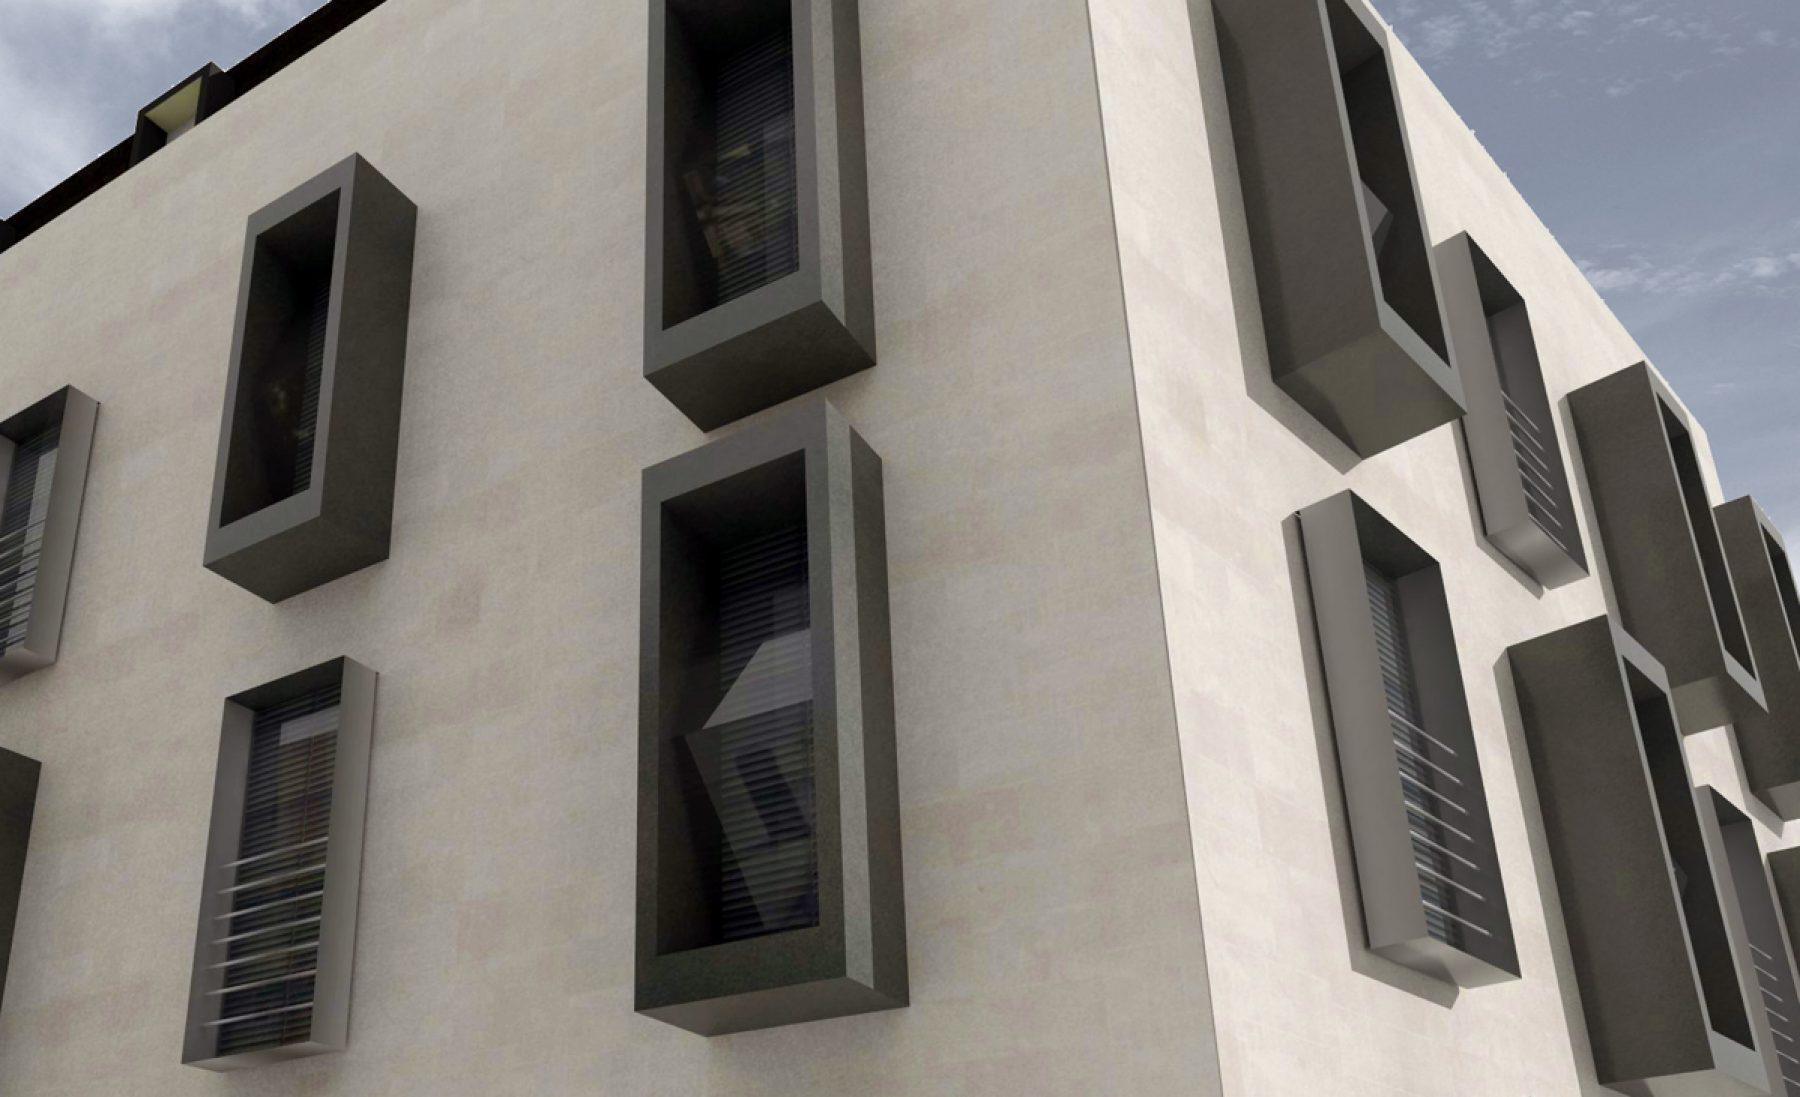 maragato lofts